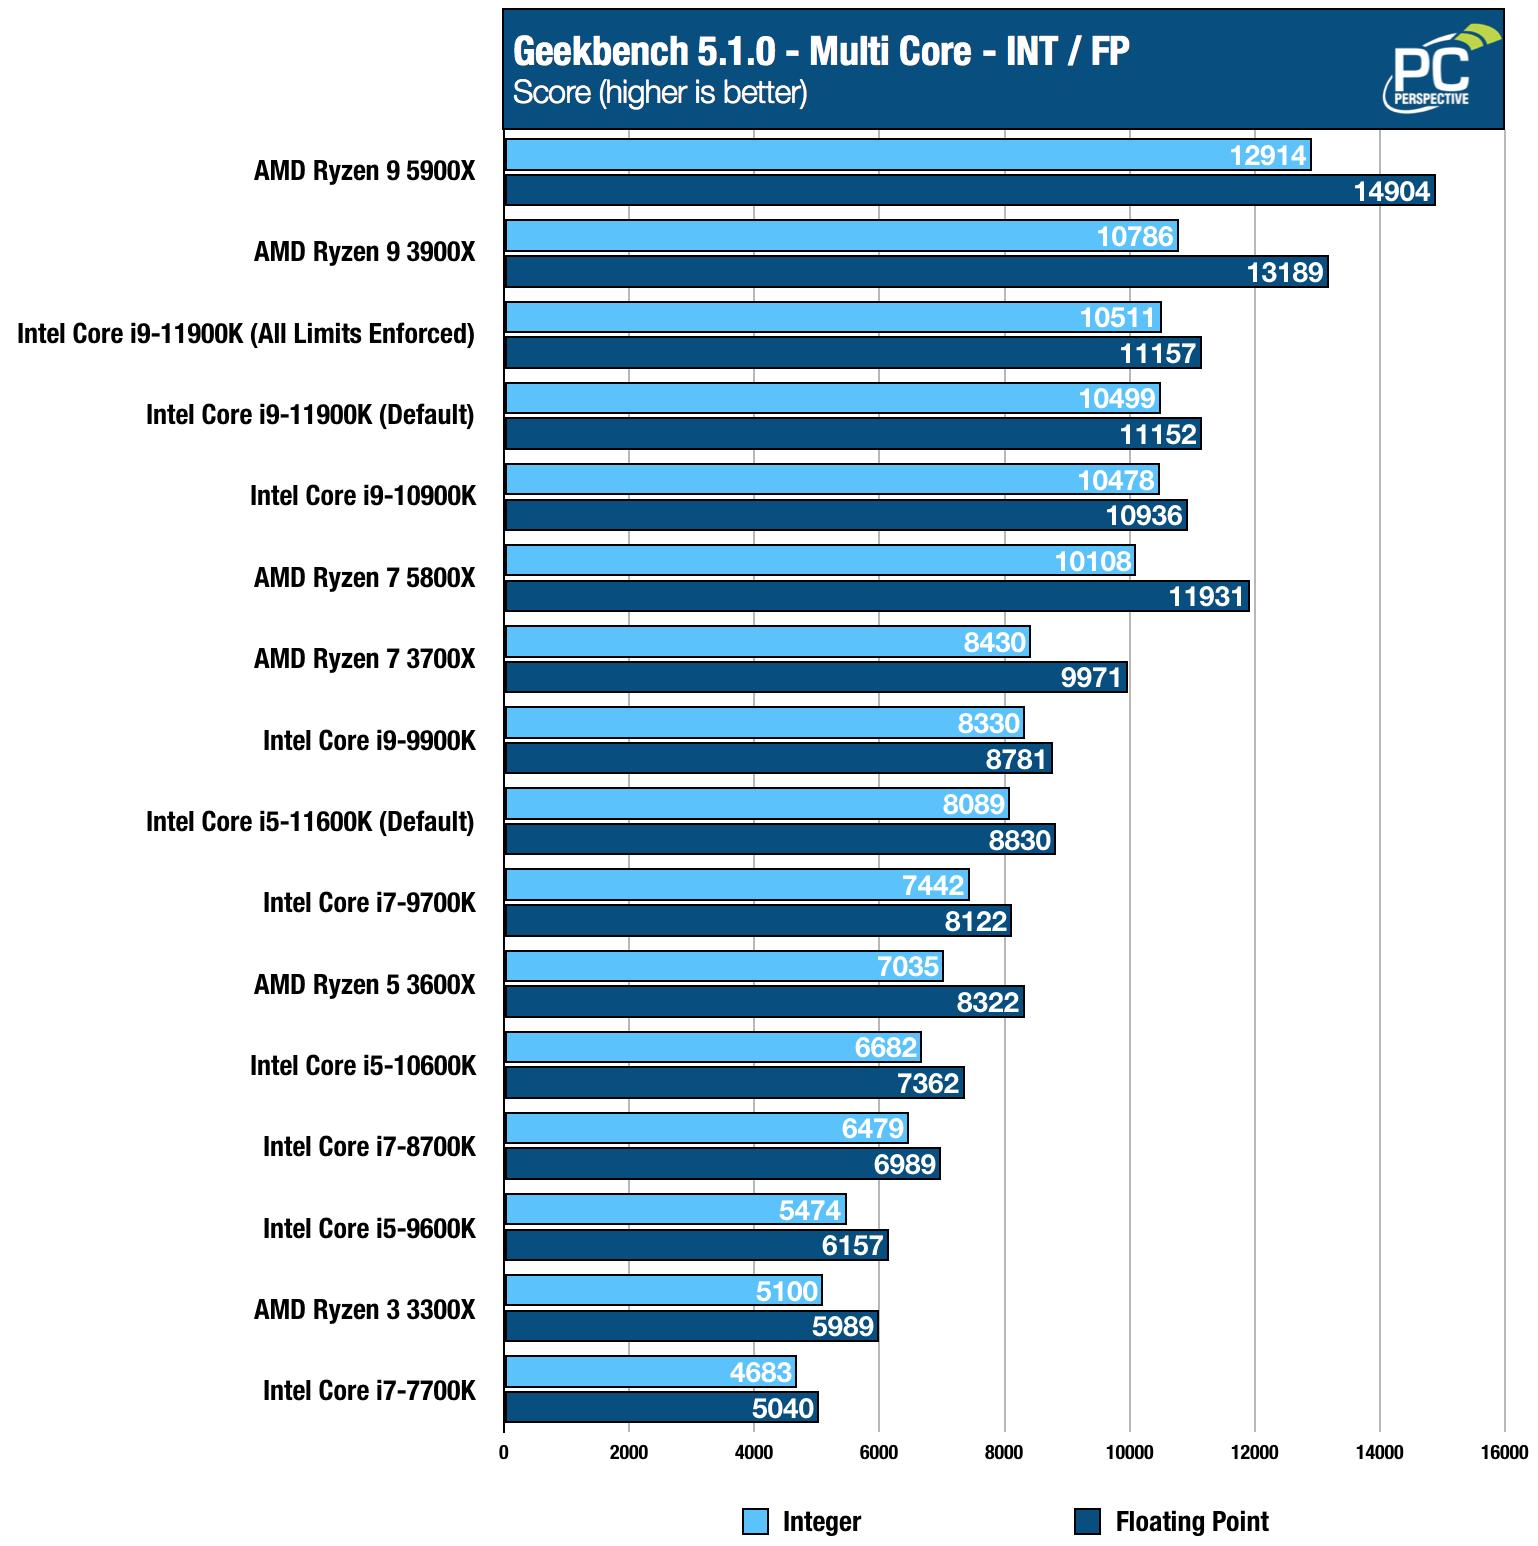 Intel Core i9-11900K i5-11600K Geekbench Multi Chart